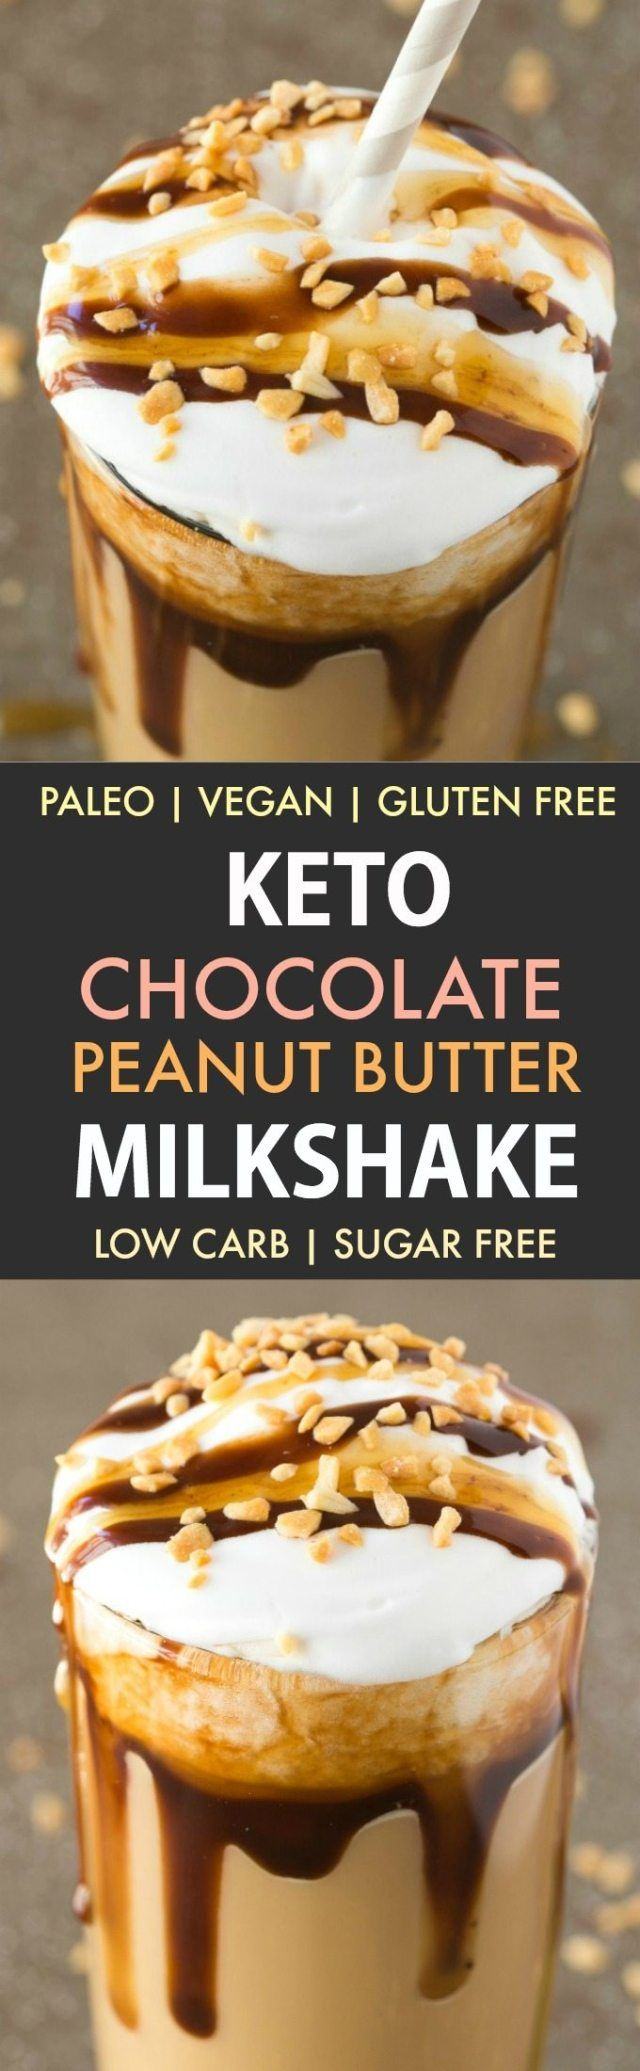 Healthy Low Carb Chocolate Peanut Butter Milkshake- A keto, vegan and paleo-frie…